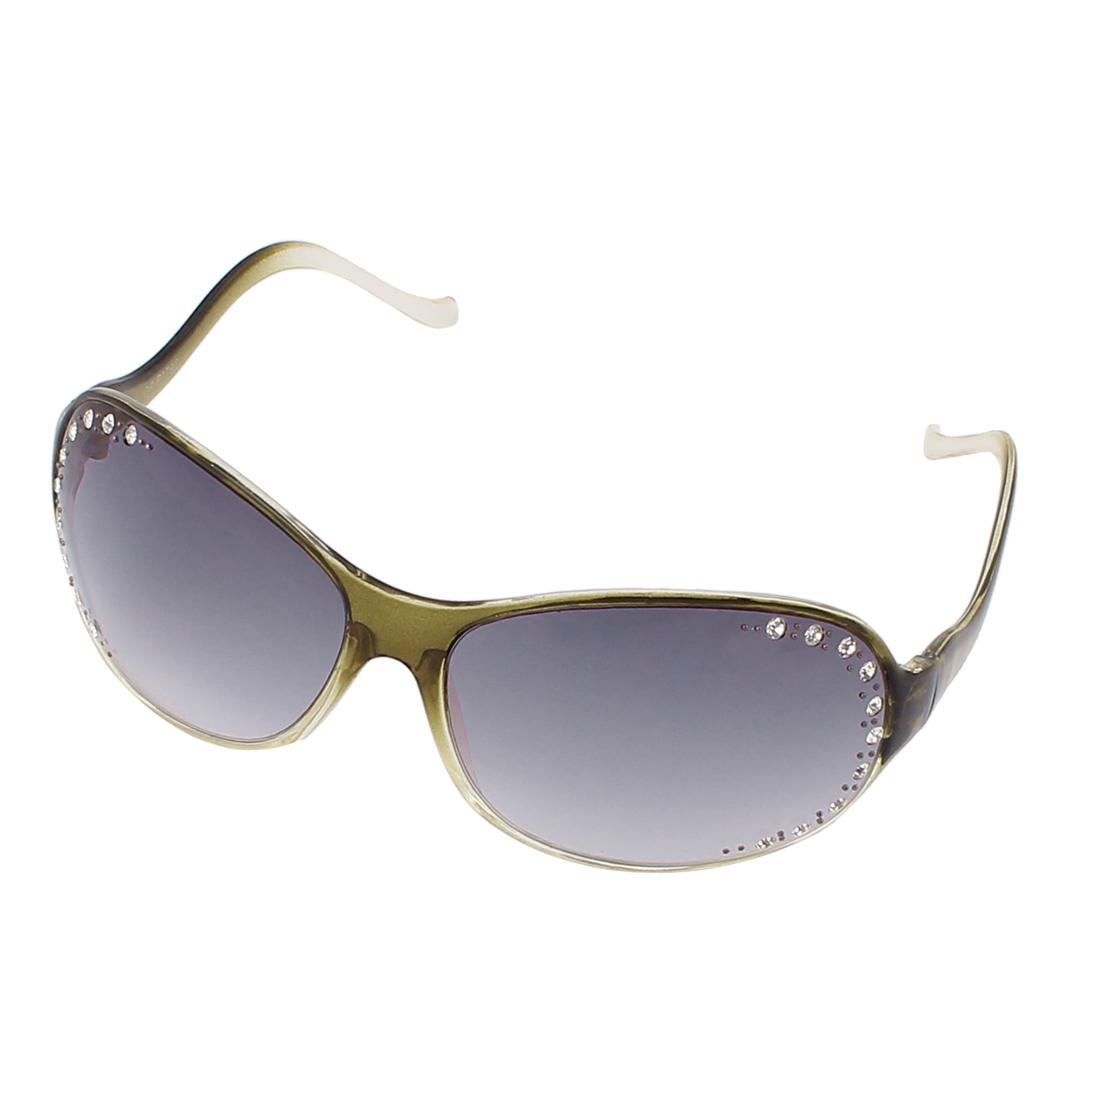 Womens Retro Style Rhinestones Decor Eyewear Sunglasses Shades